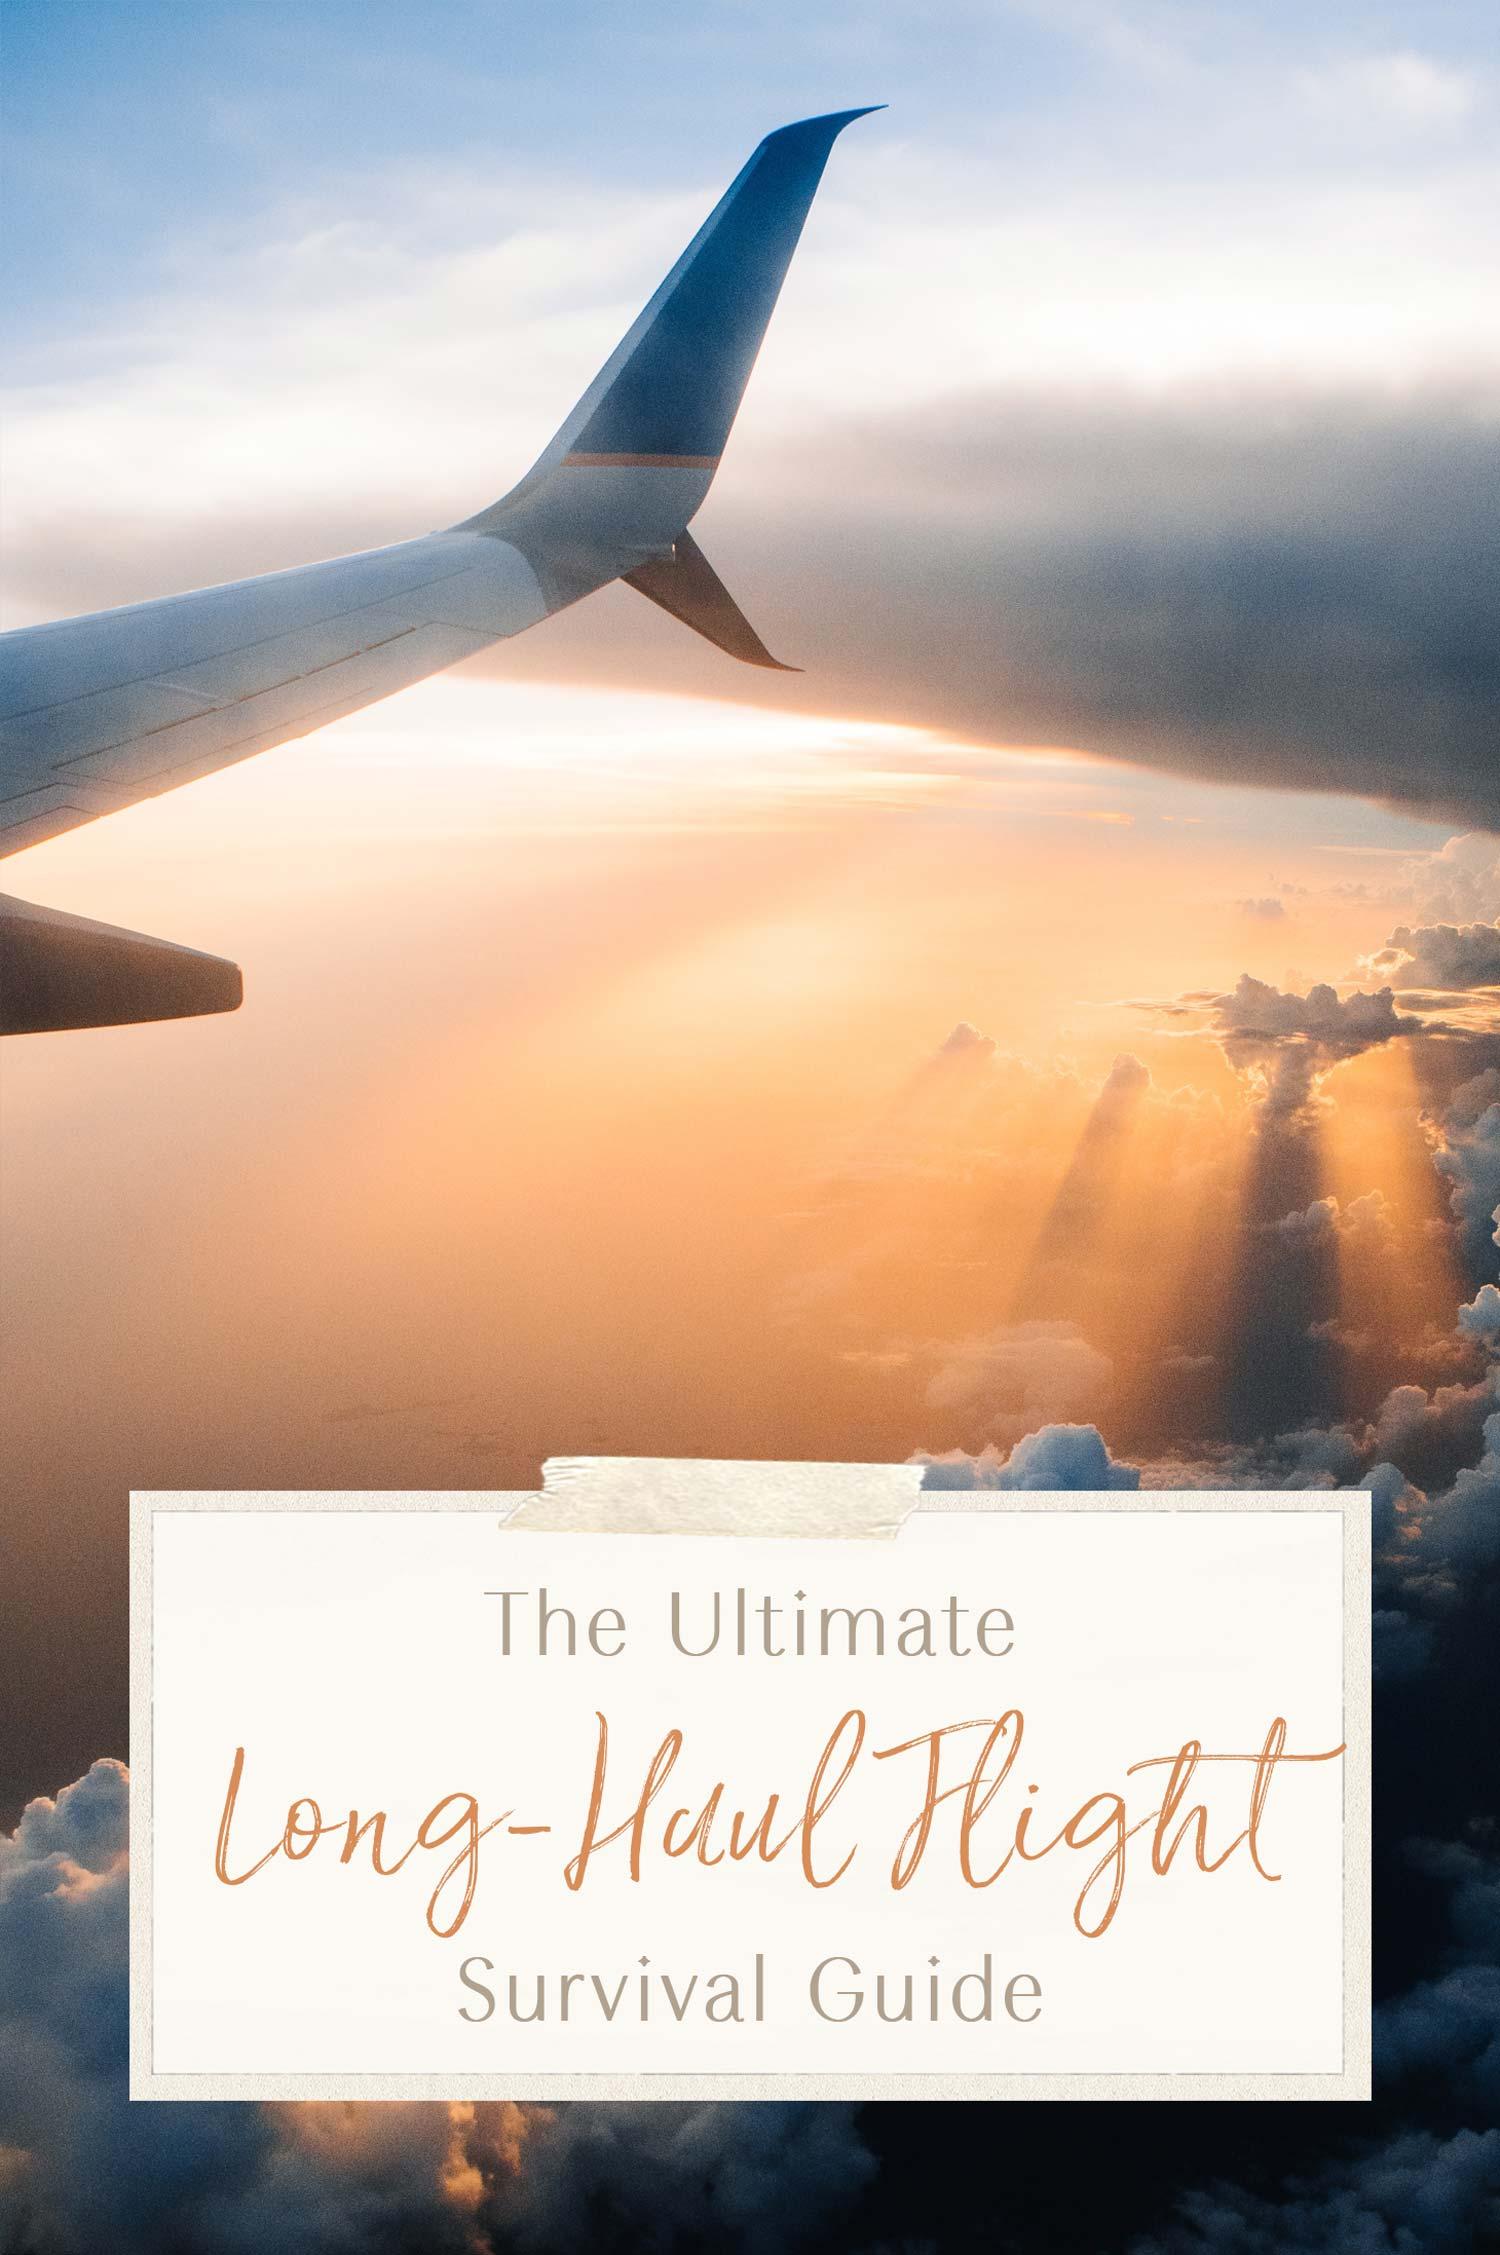 the ultimate long-haul flight survival guide